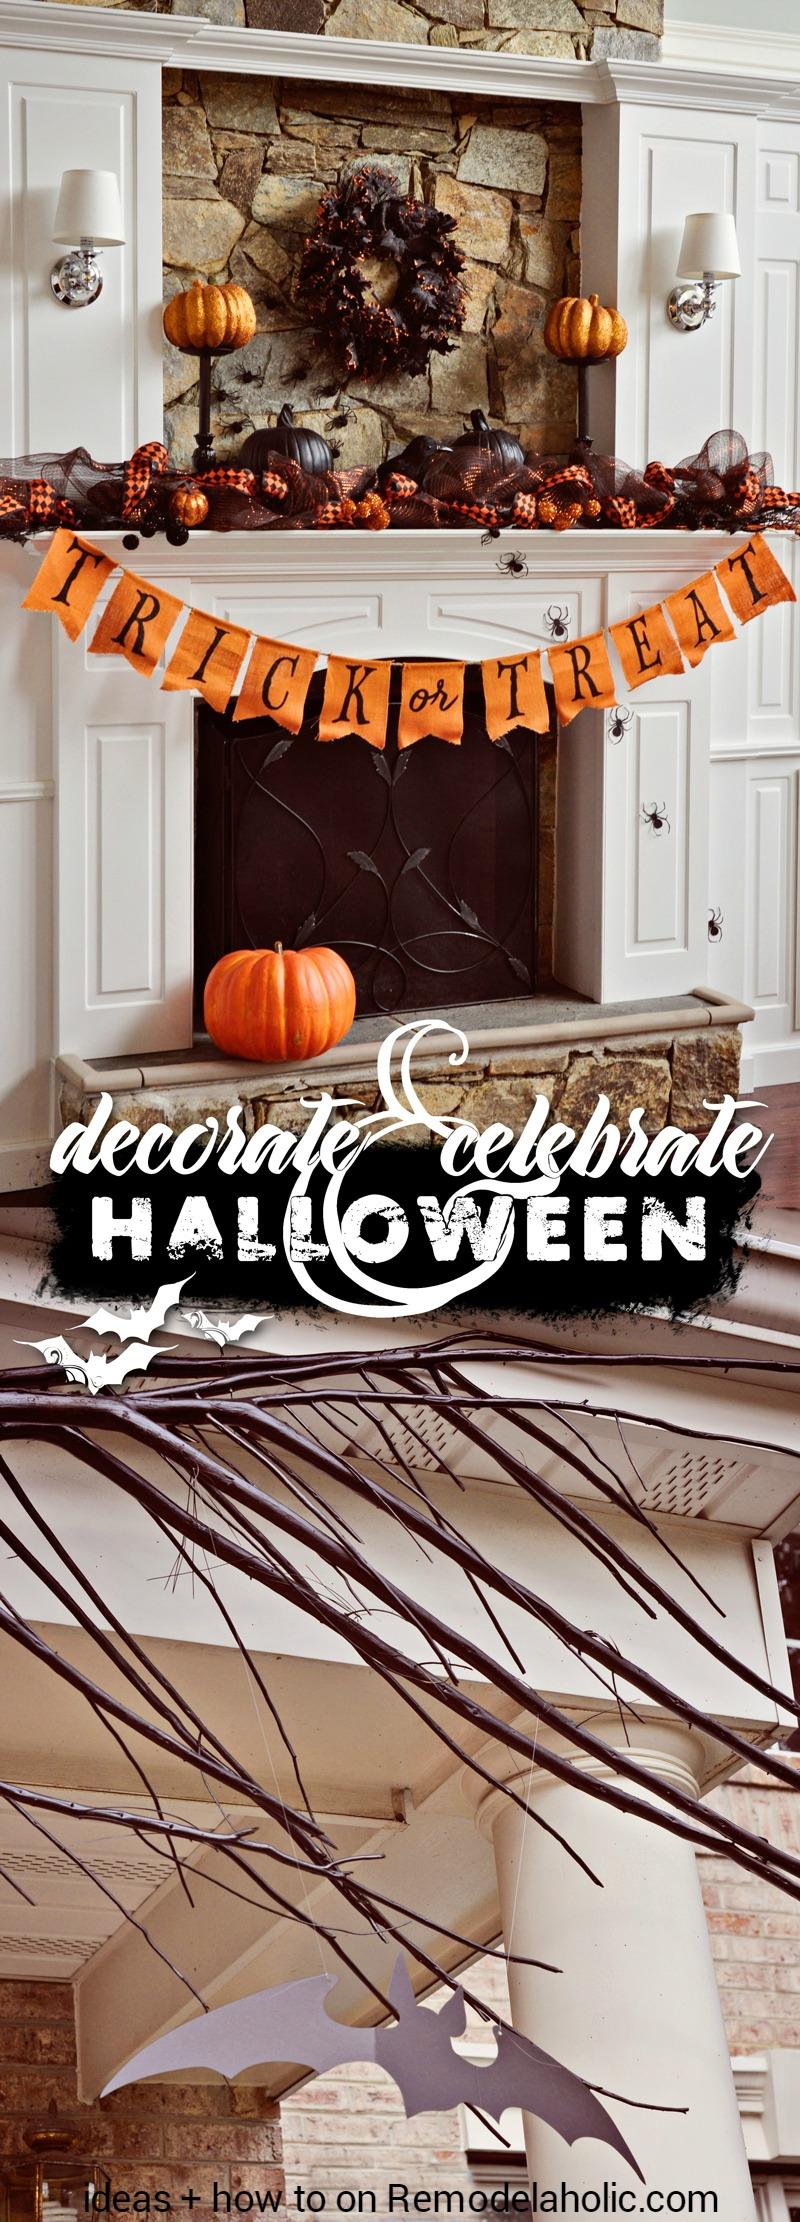 Remodelaholic Decorate &amp Celebrate: Simple Halloween Decor - Basic Halloween Decorations